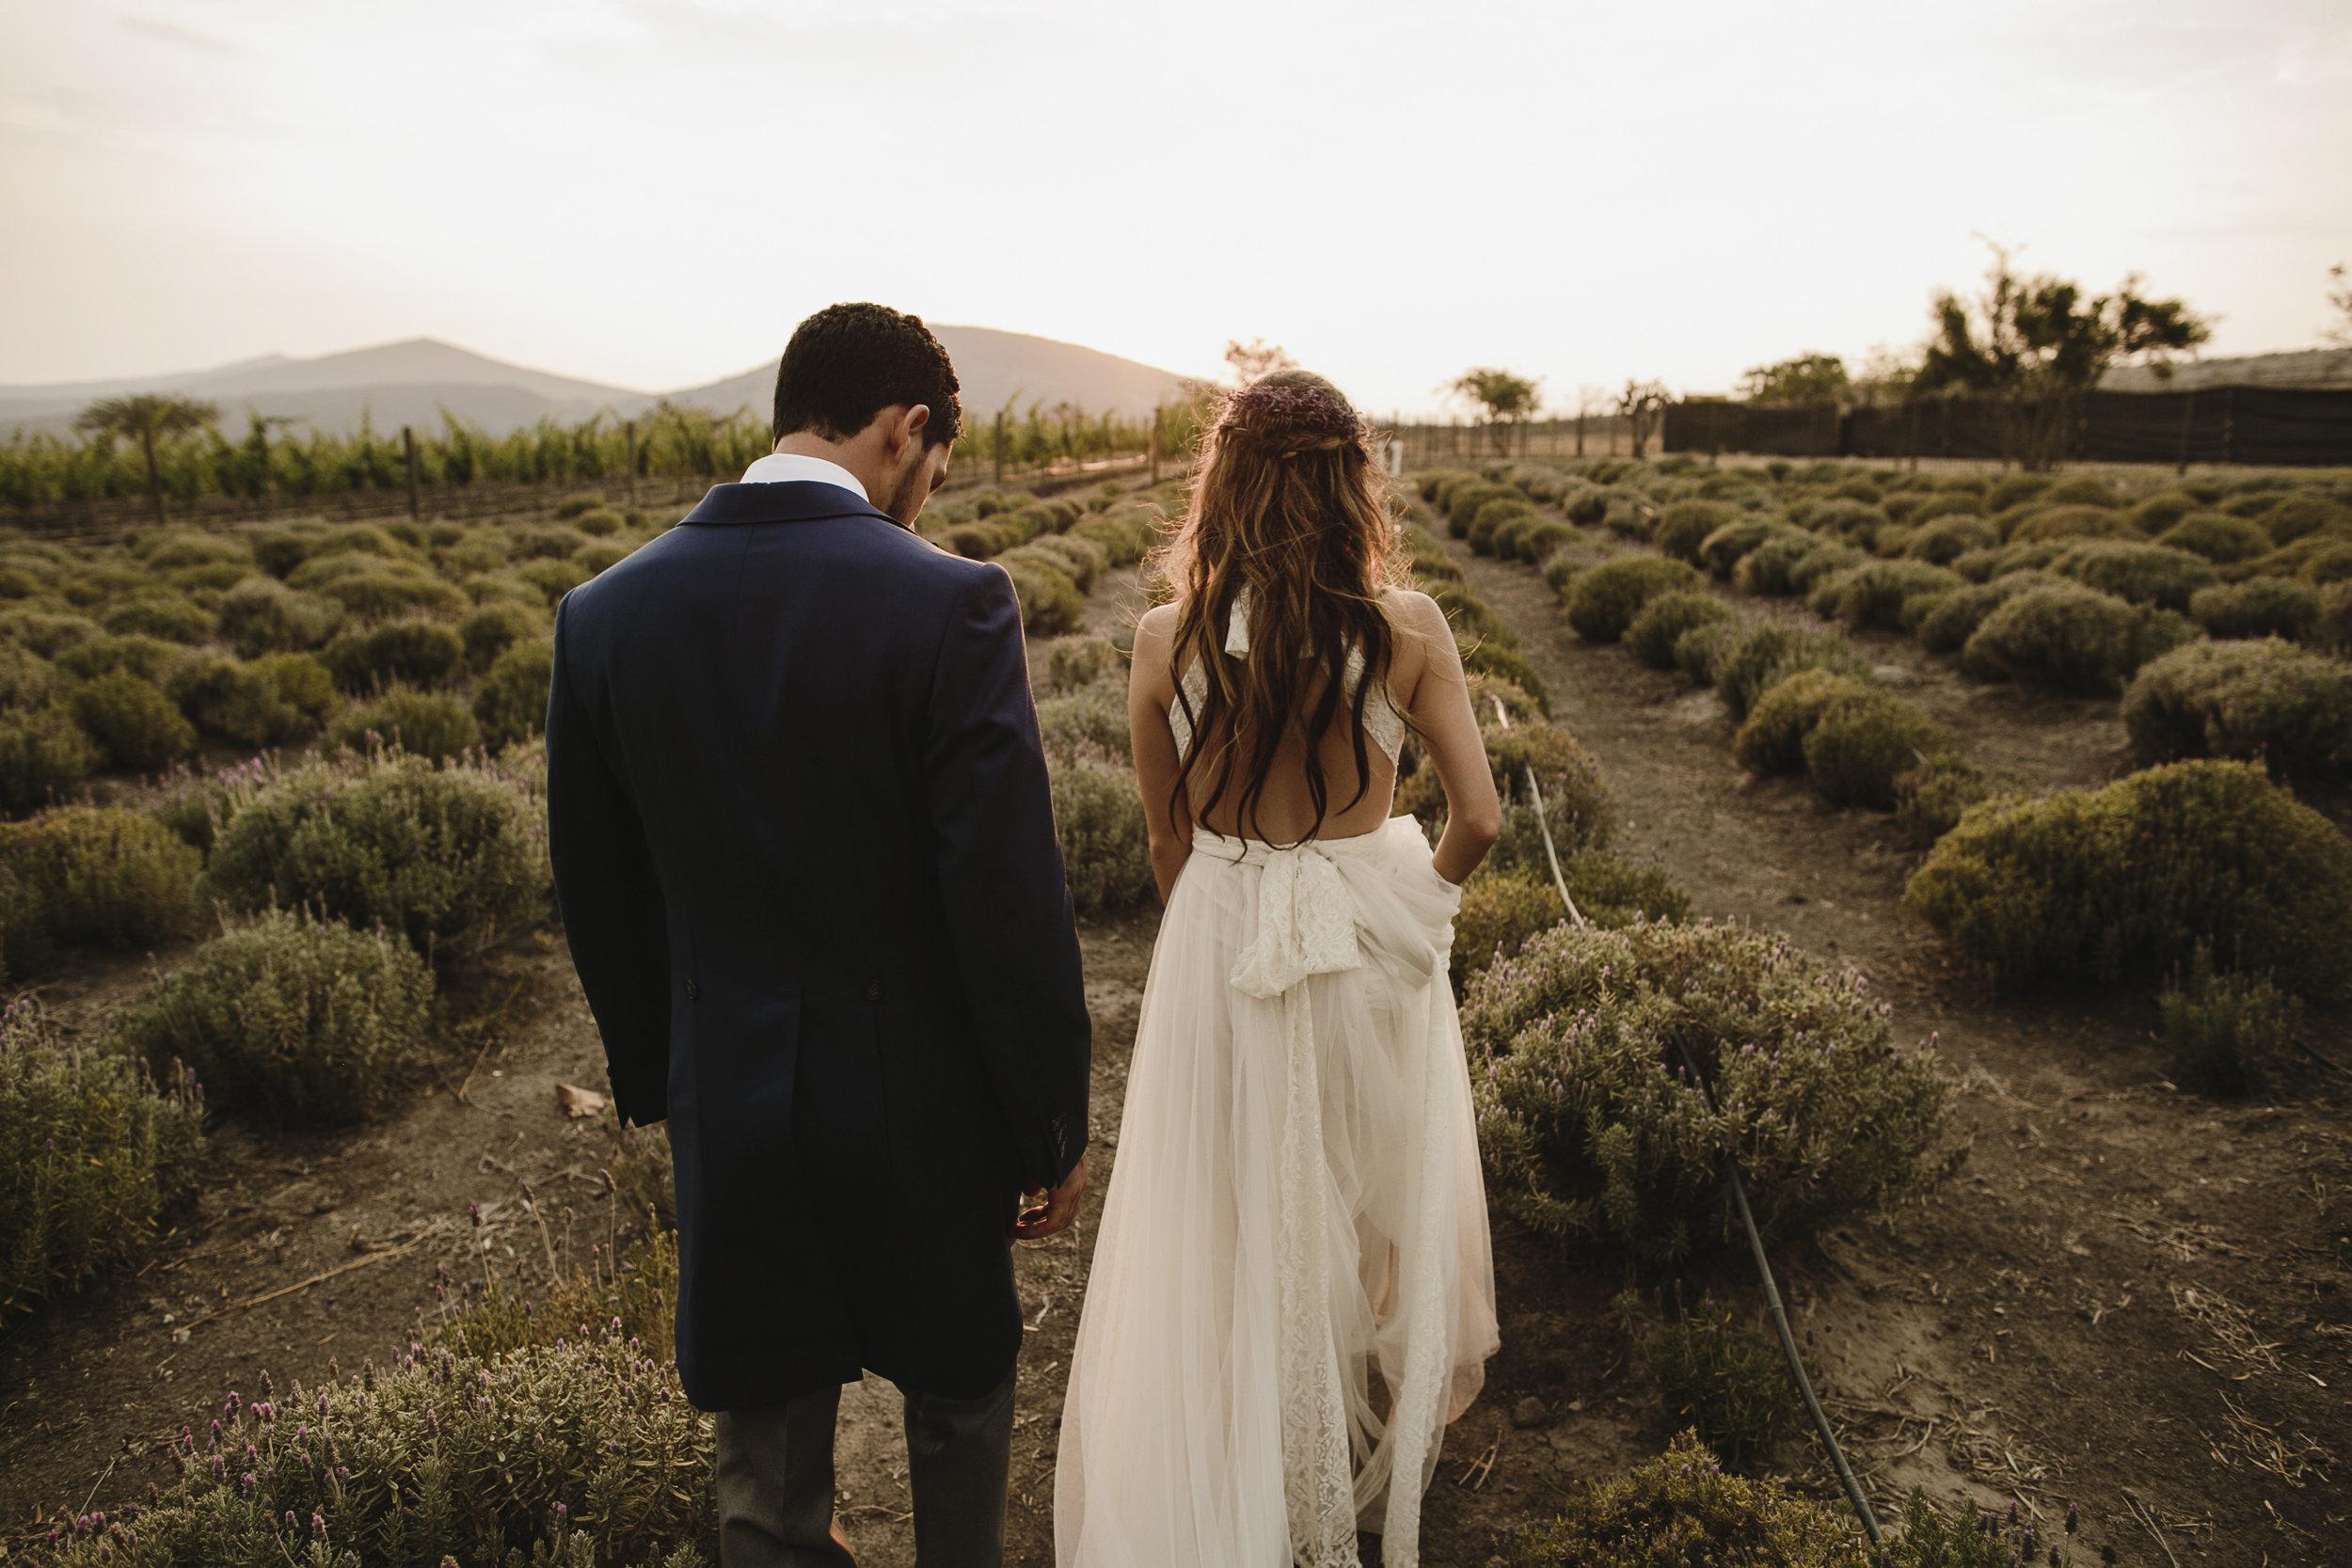 alfons_flores_destination_wedding_photography_mavi_david-1858.JPG